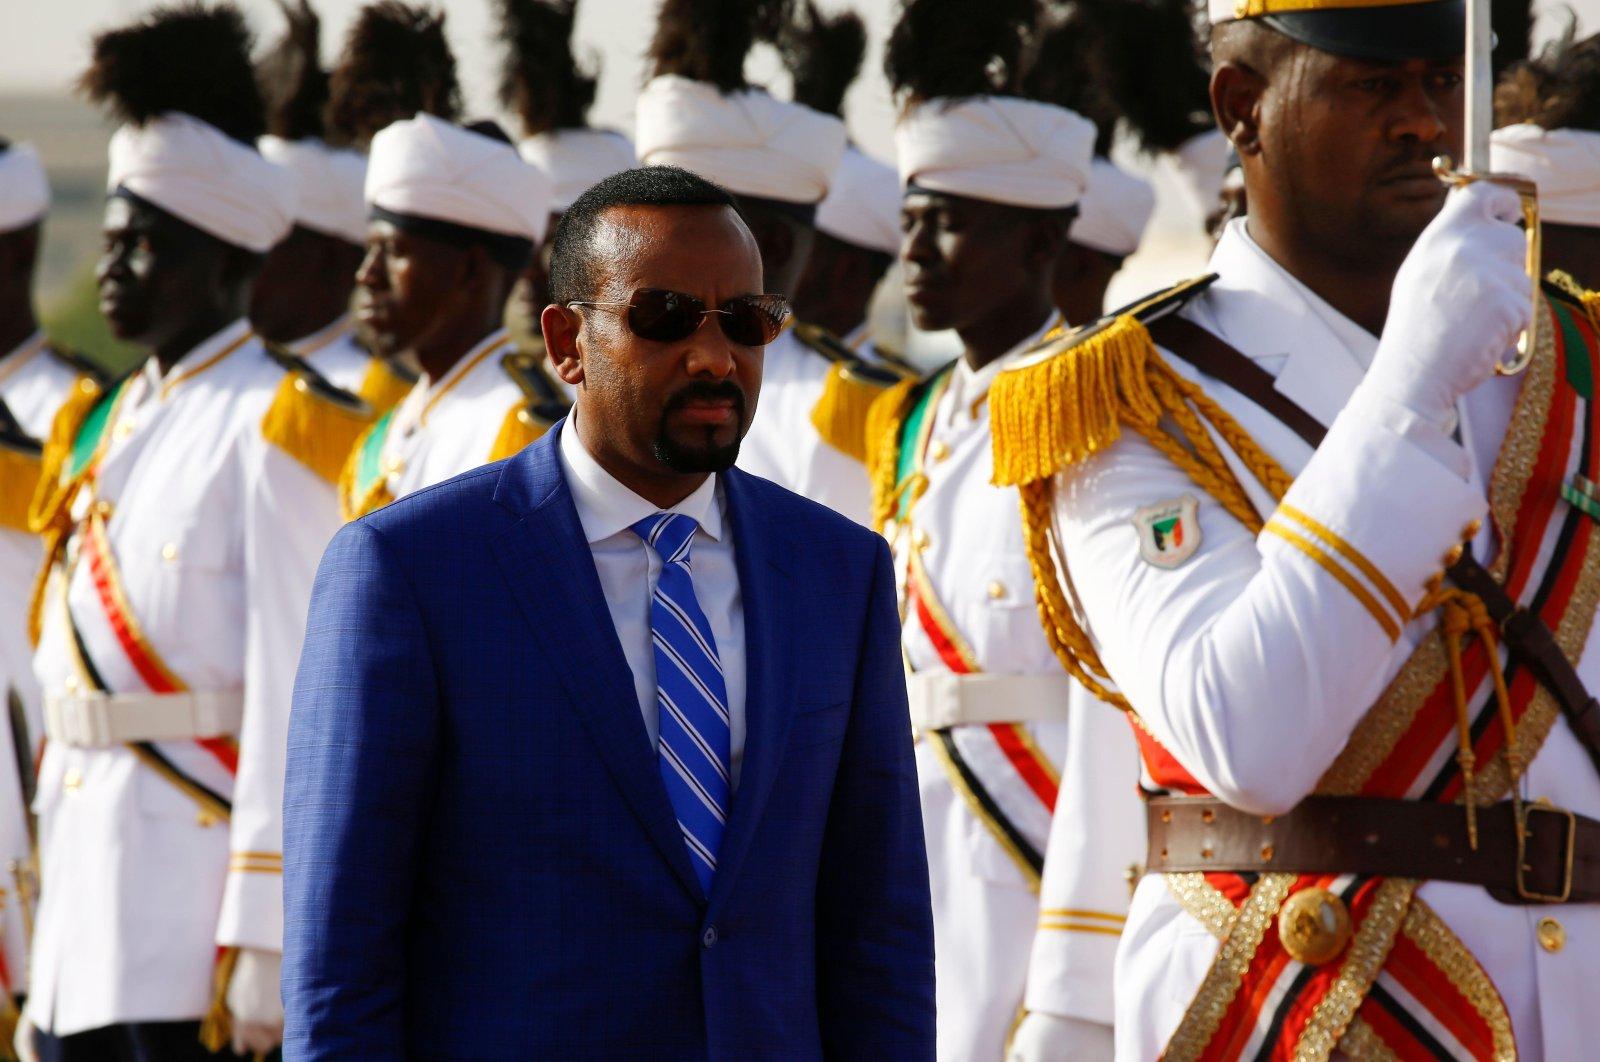 Ethiopian Prime Minister Abiy Ahmed reviews the honour guard following his arrival in Khartoum, Sudan, May 2, 2018. (AFP Photo)